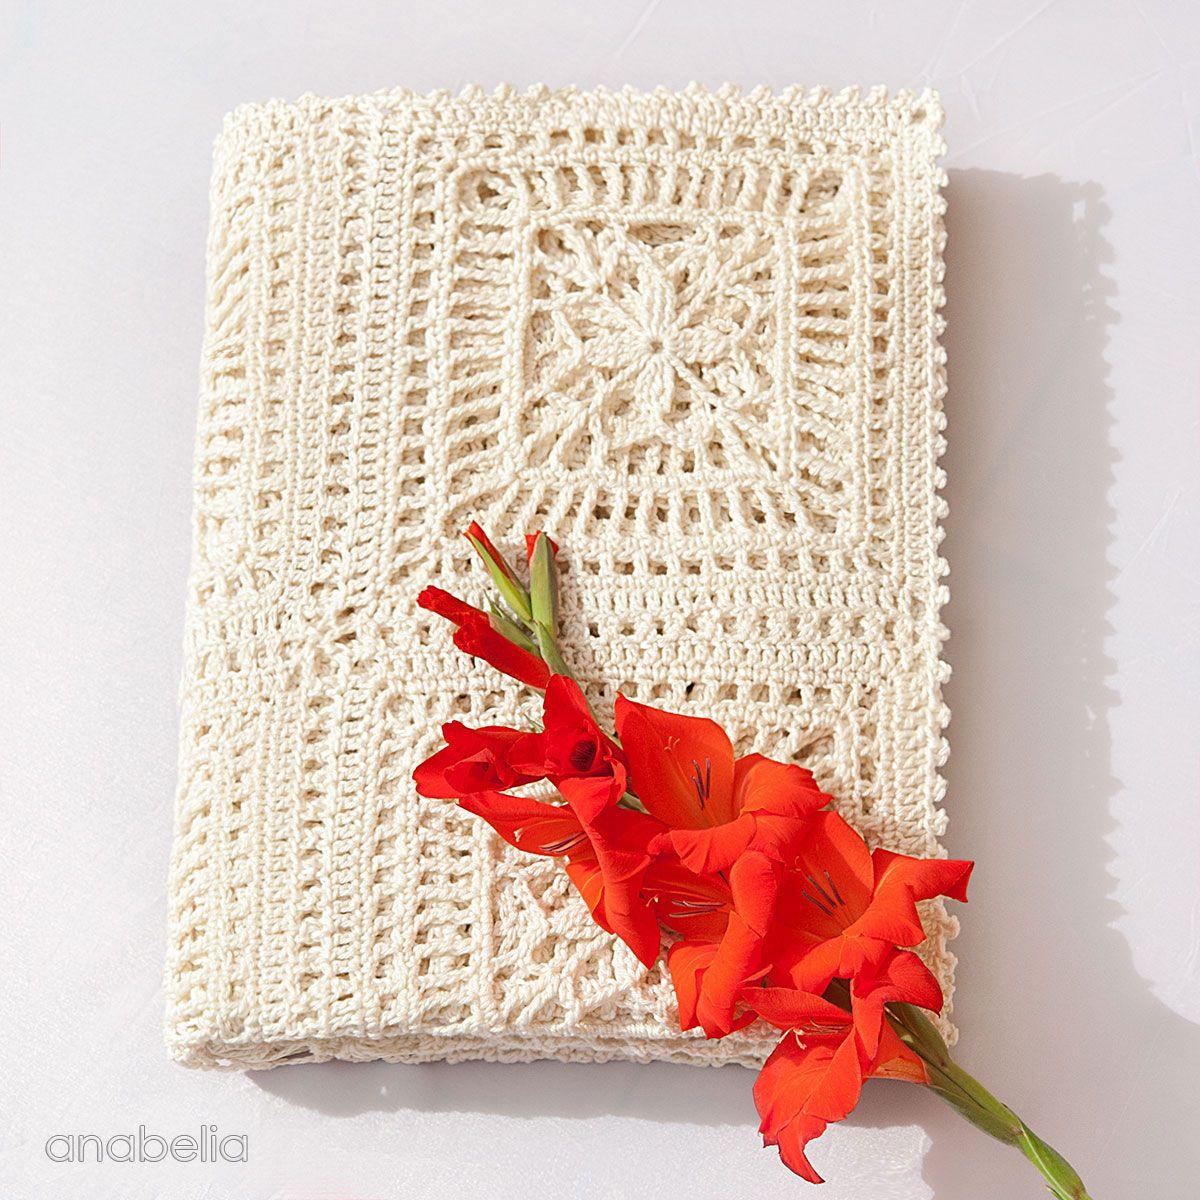 Anabelia craft design: Lily crochet blanket, pattern | Crochet ...